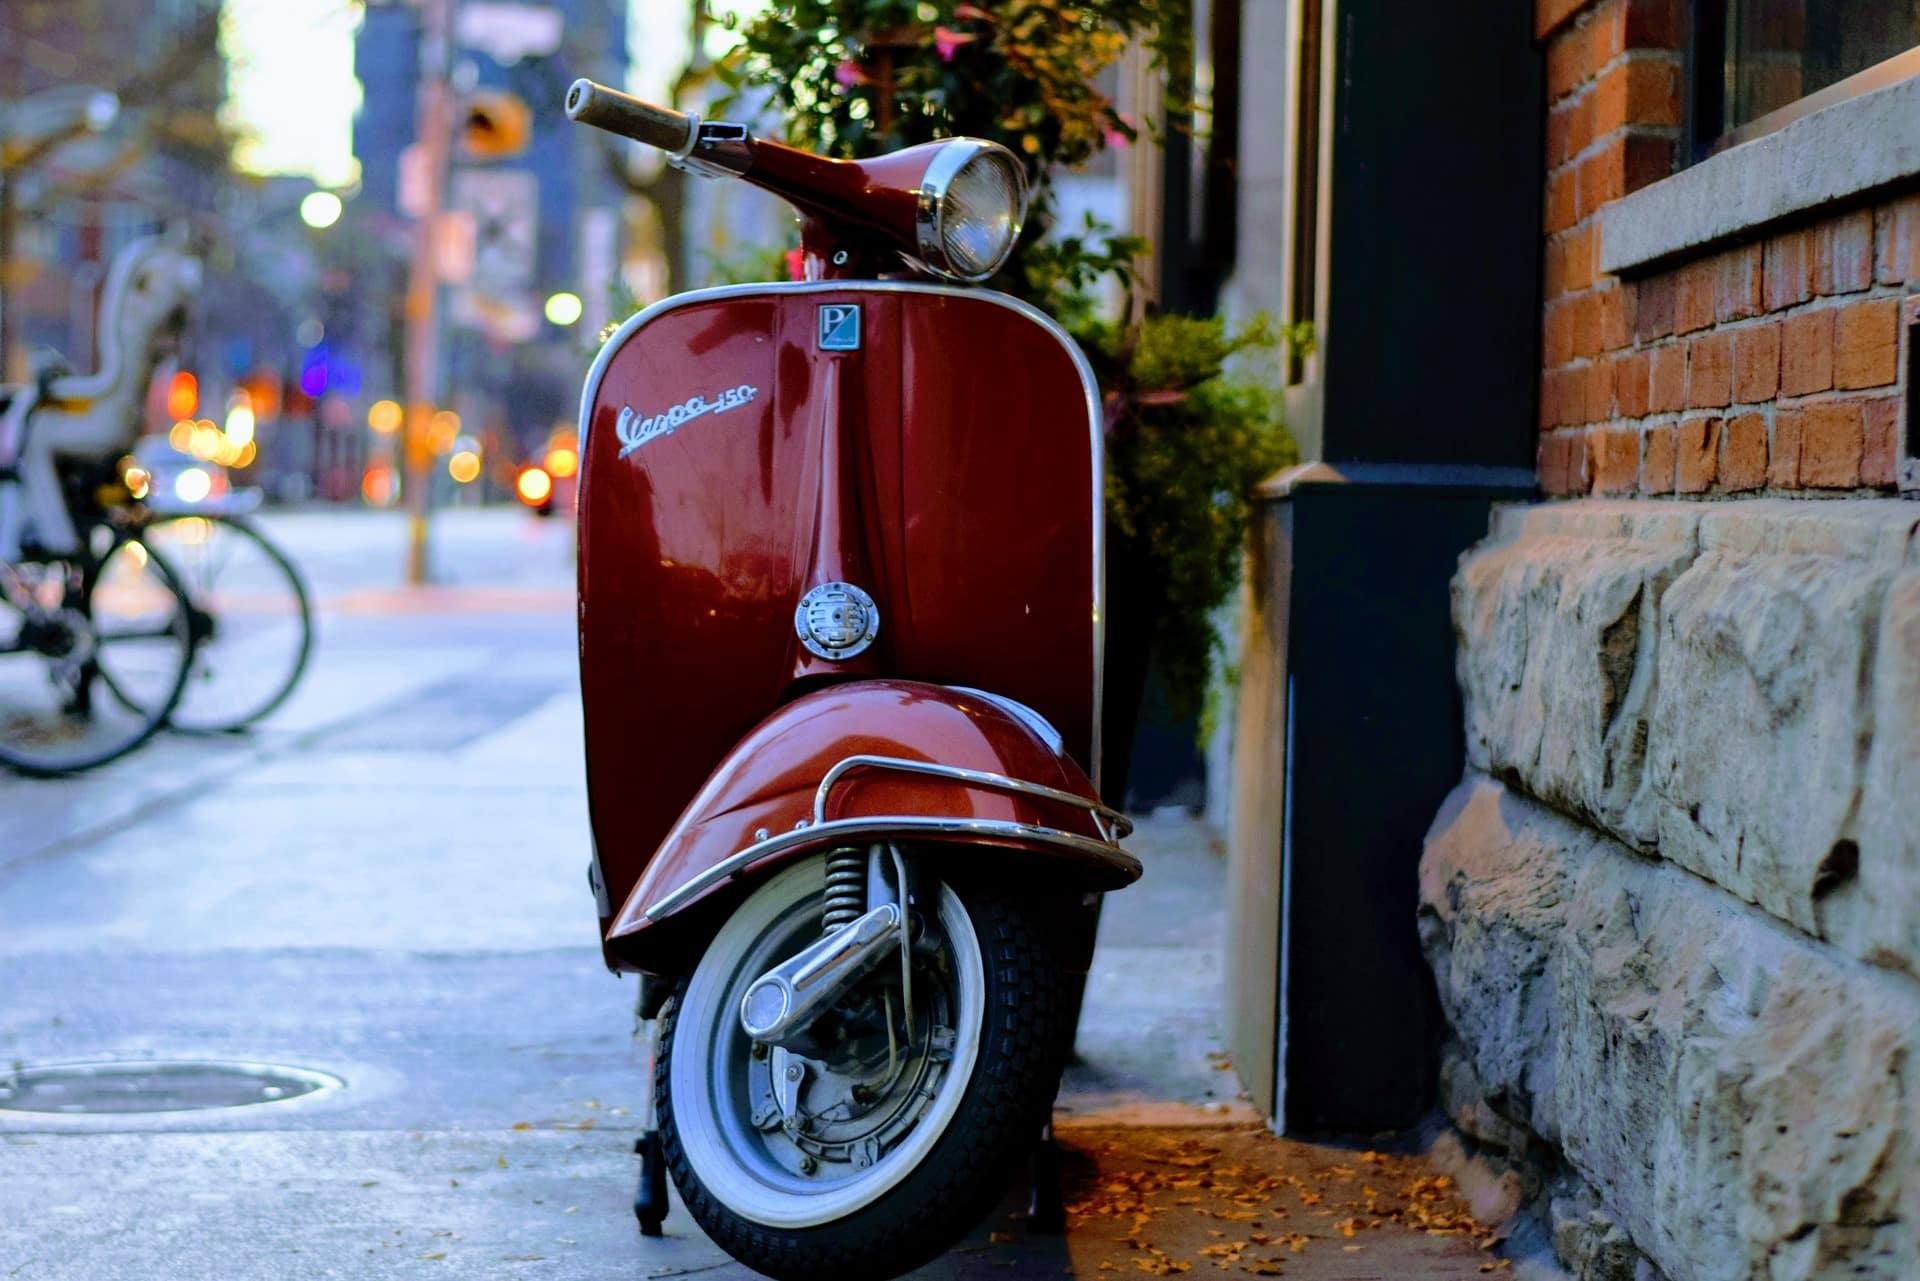 assurance-temporaire-scooter-50